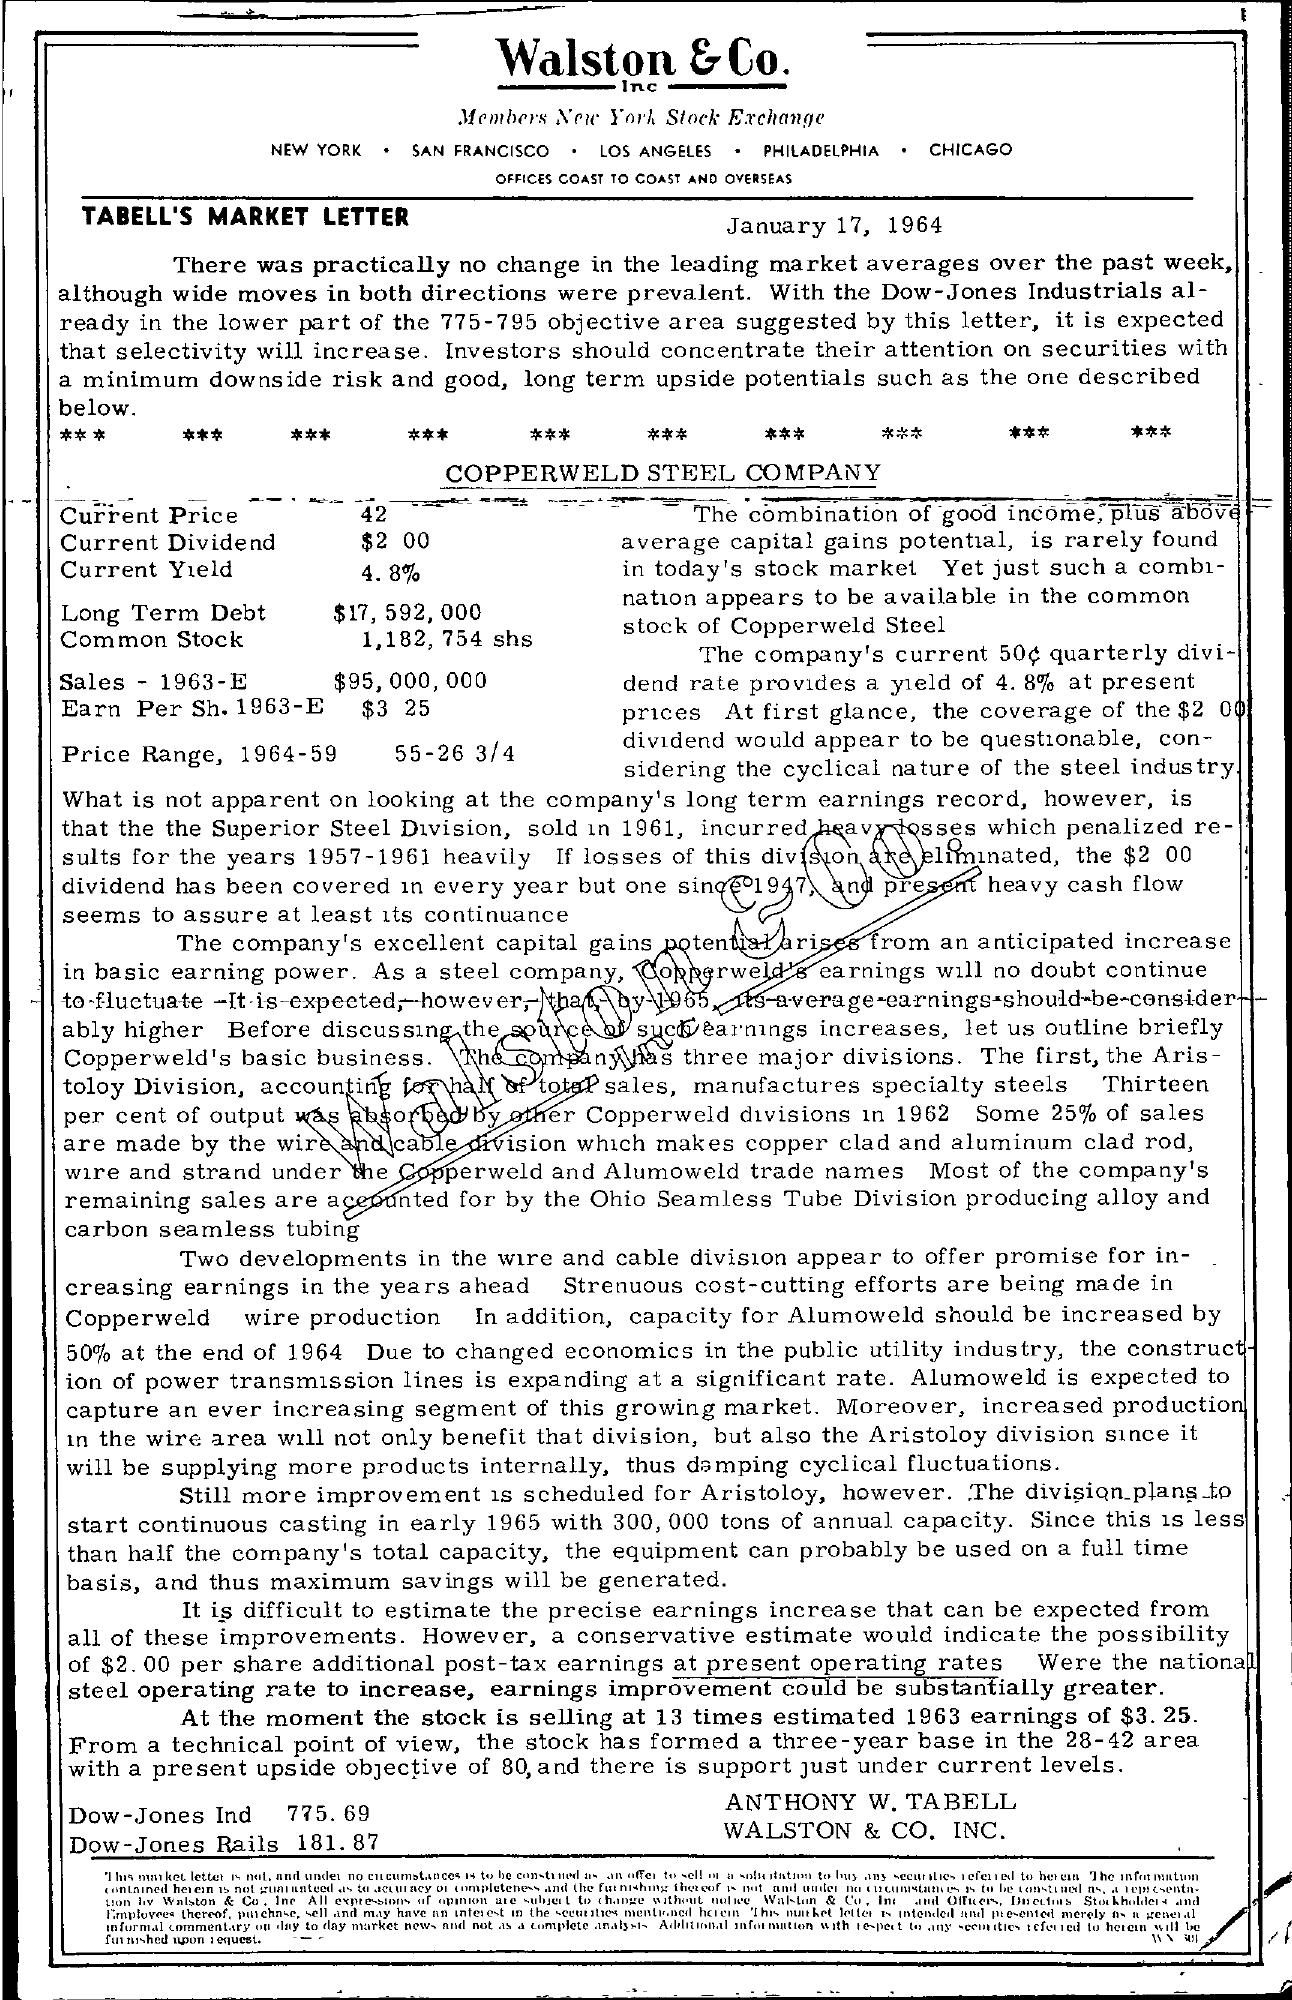 Tabell's Market Letter - January 17, 1964